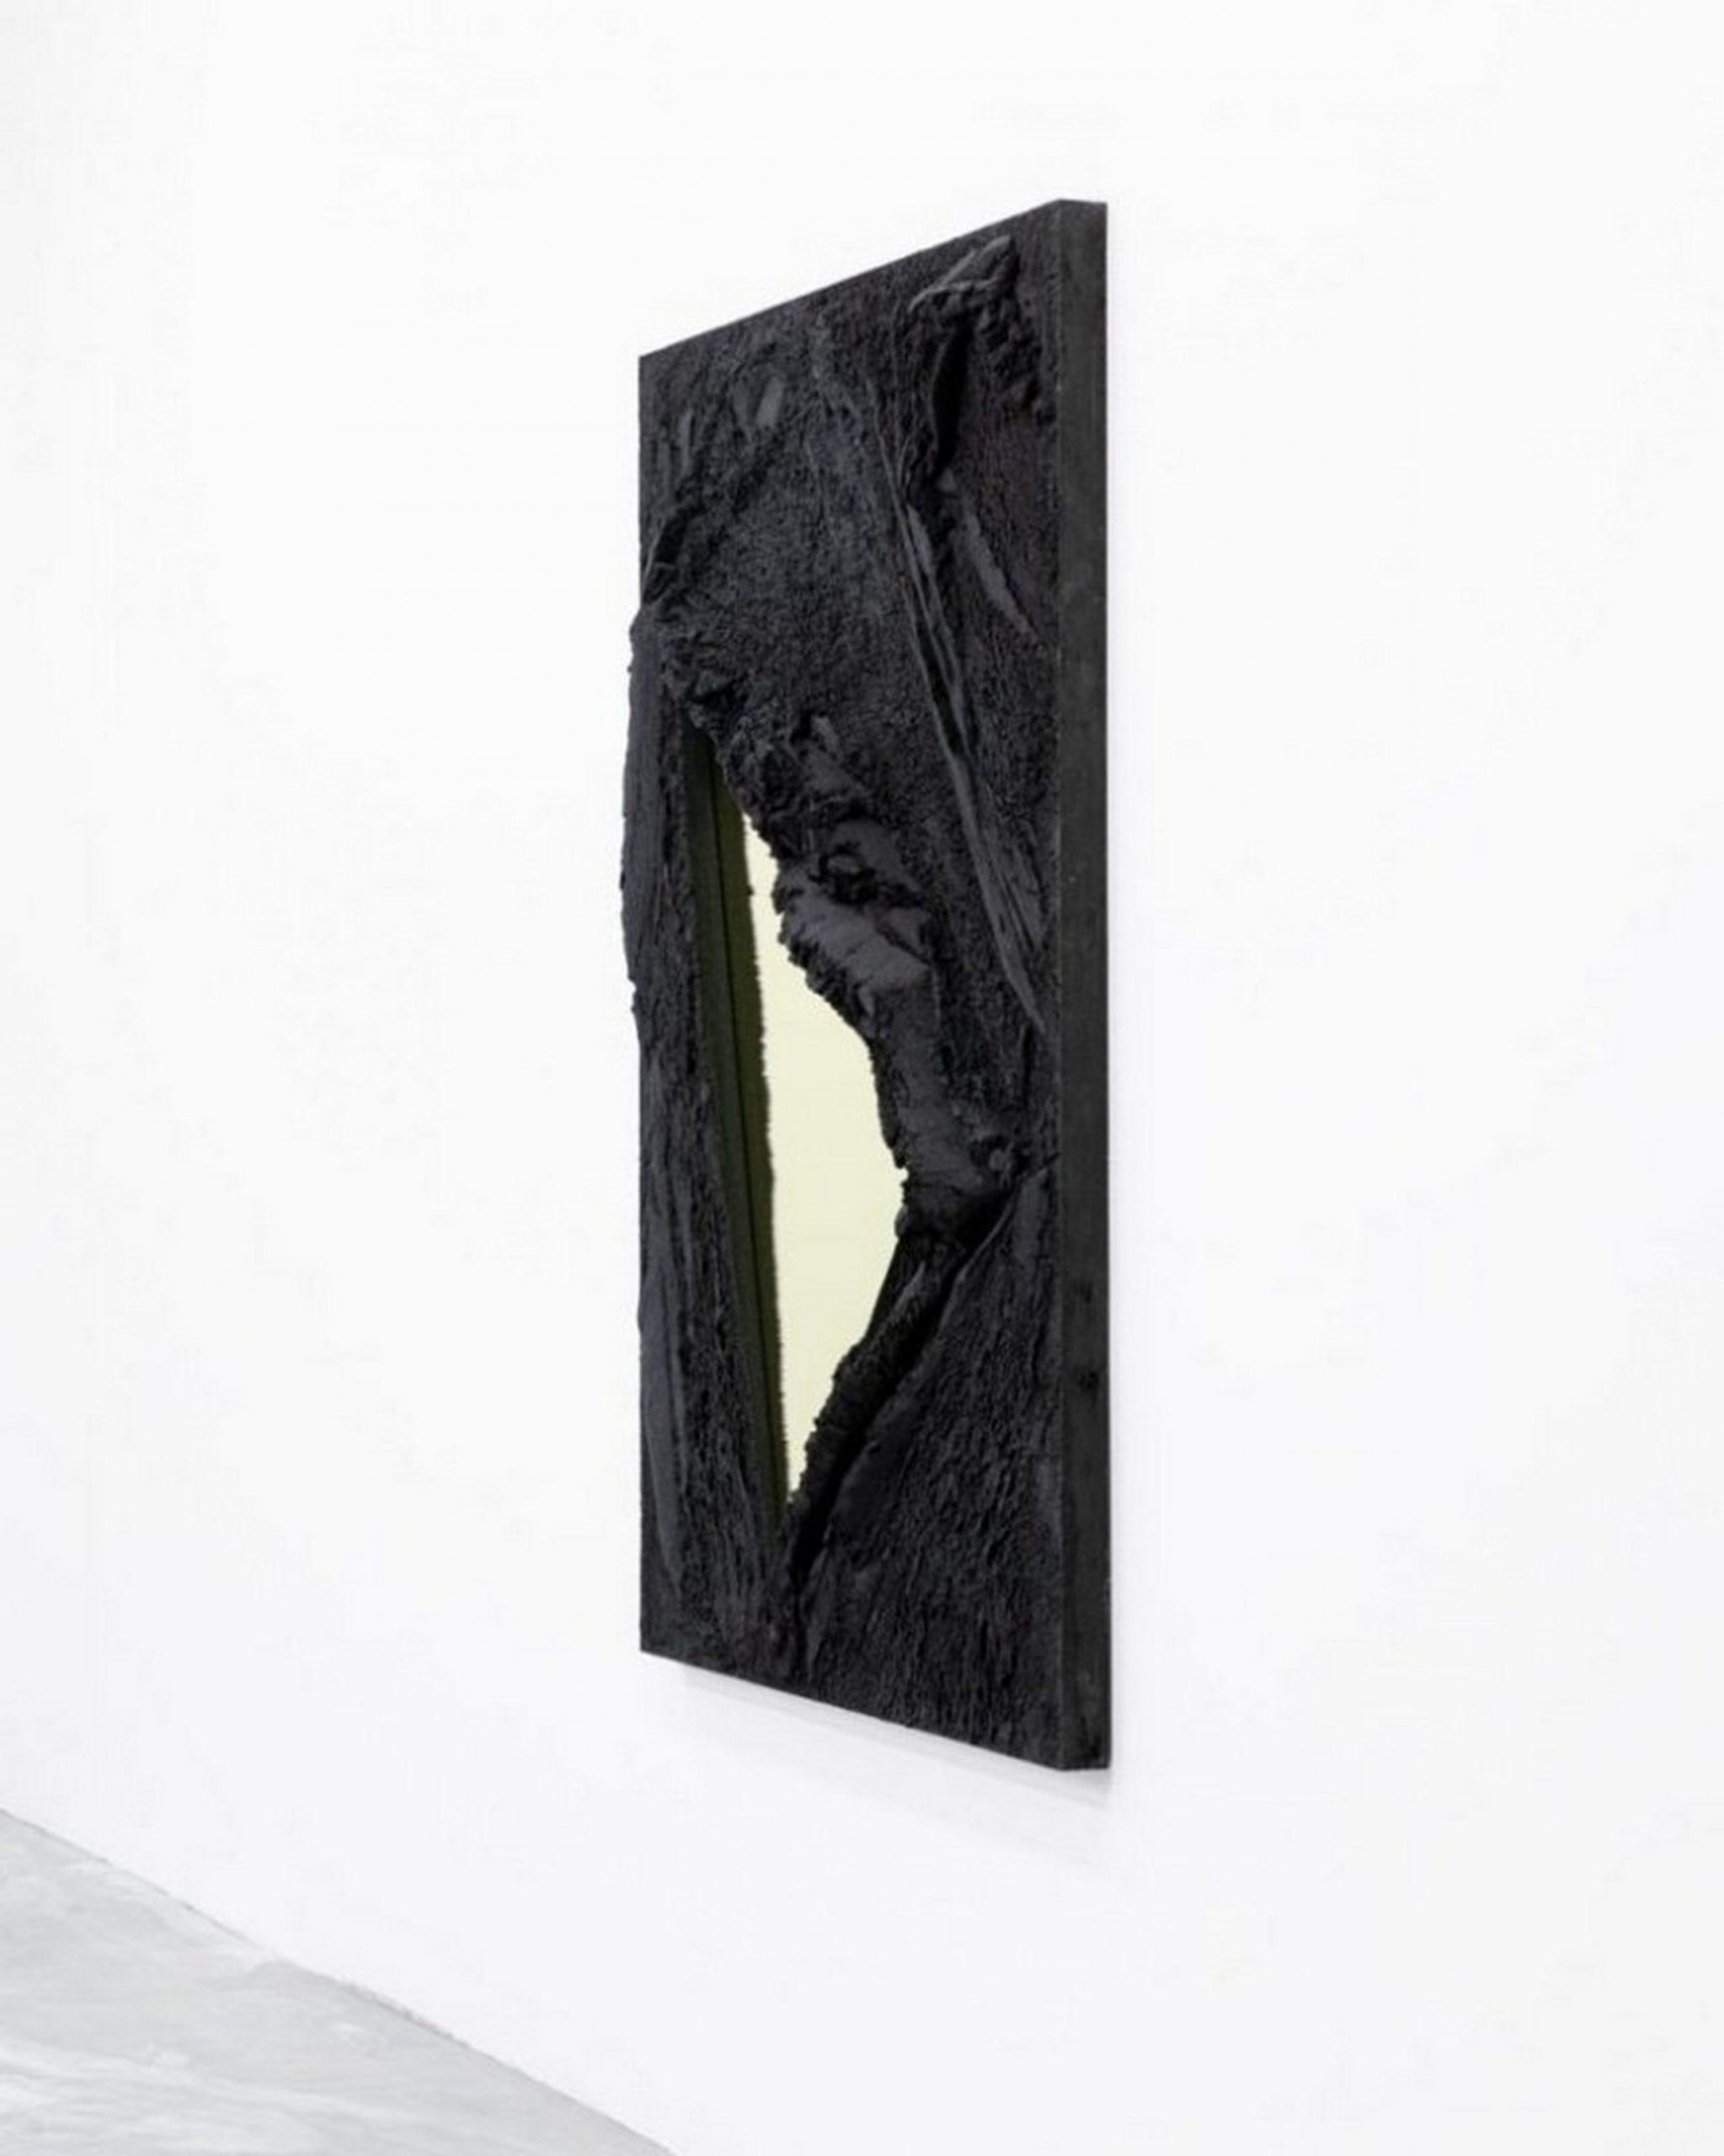 Design Inspiration with Fernando Mastrangelo's Mirror